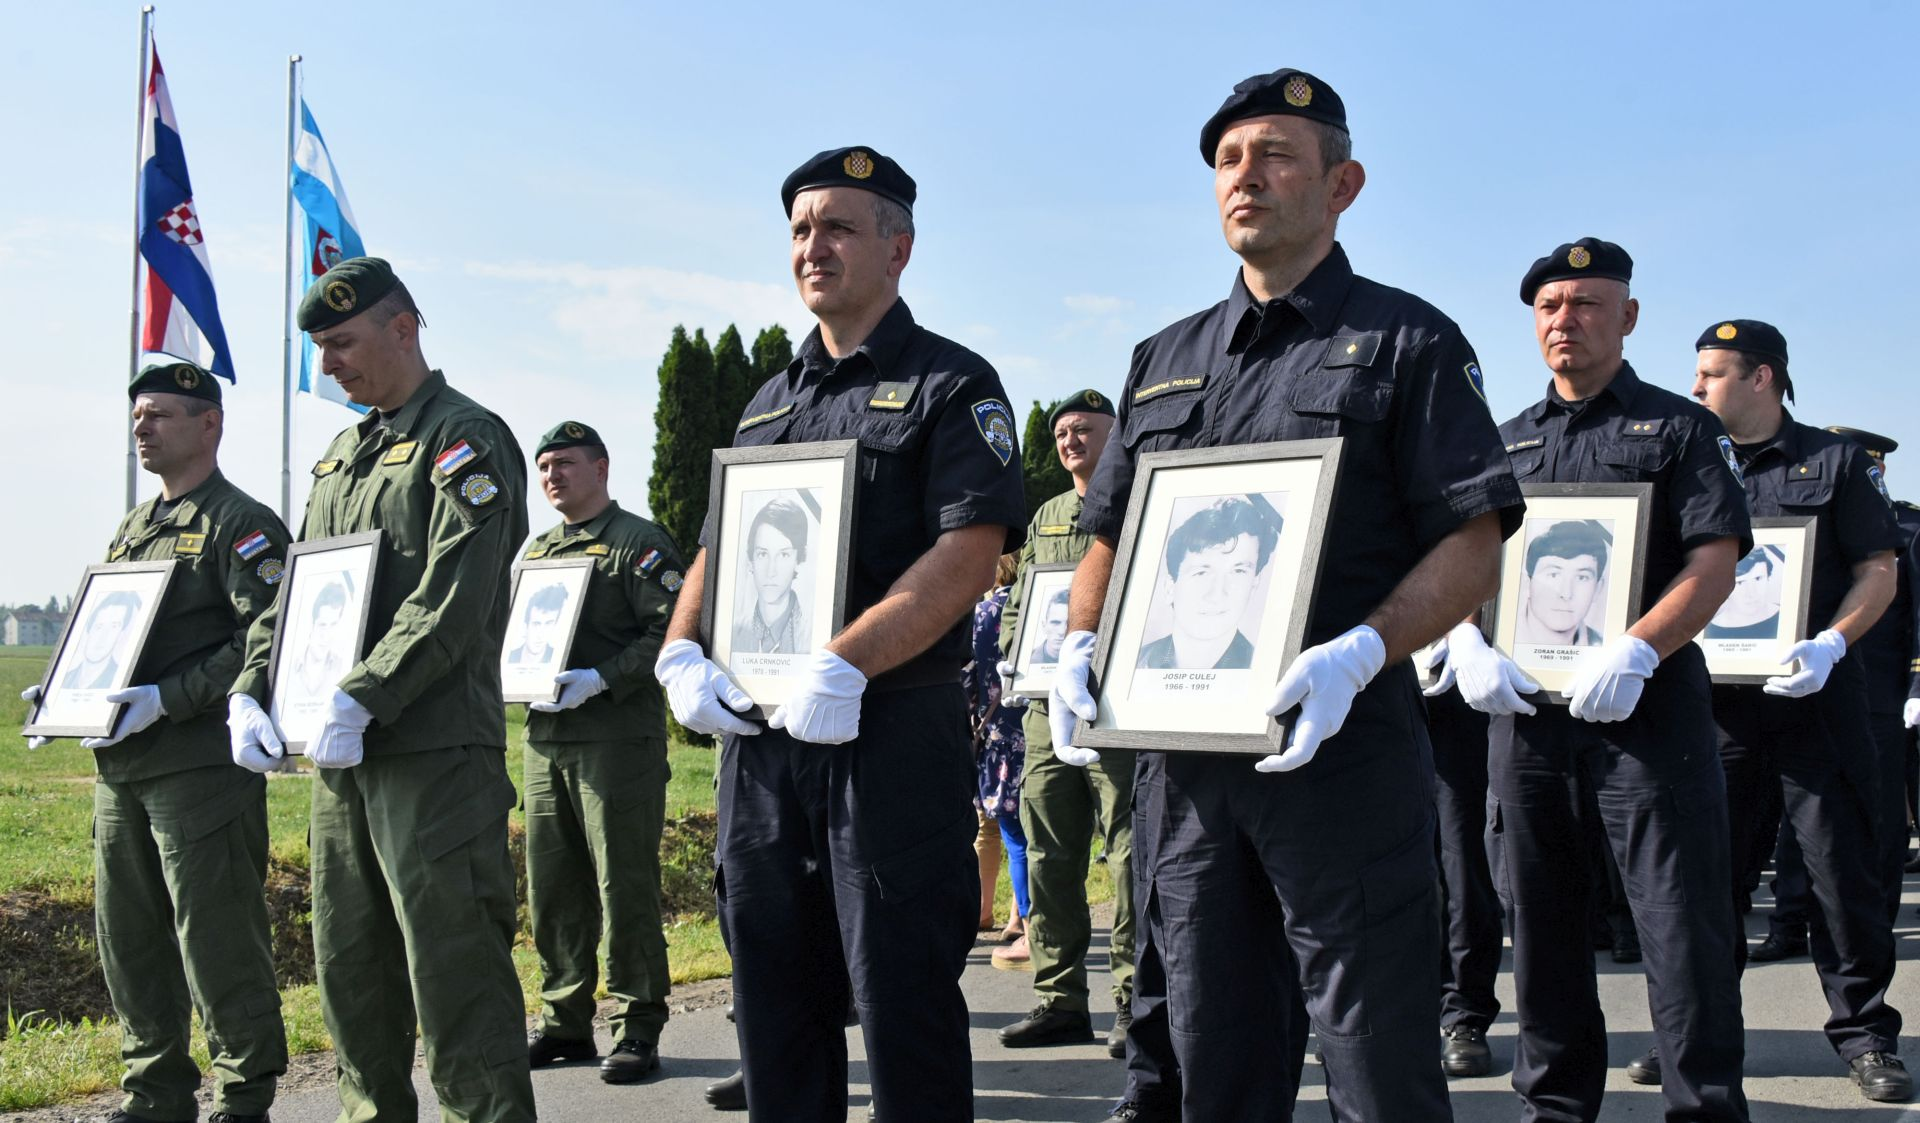 BOROVO Obilježena 27. obljetnica ubojstva 12 redarstvenika